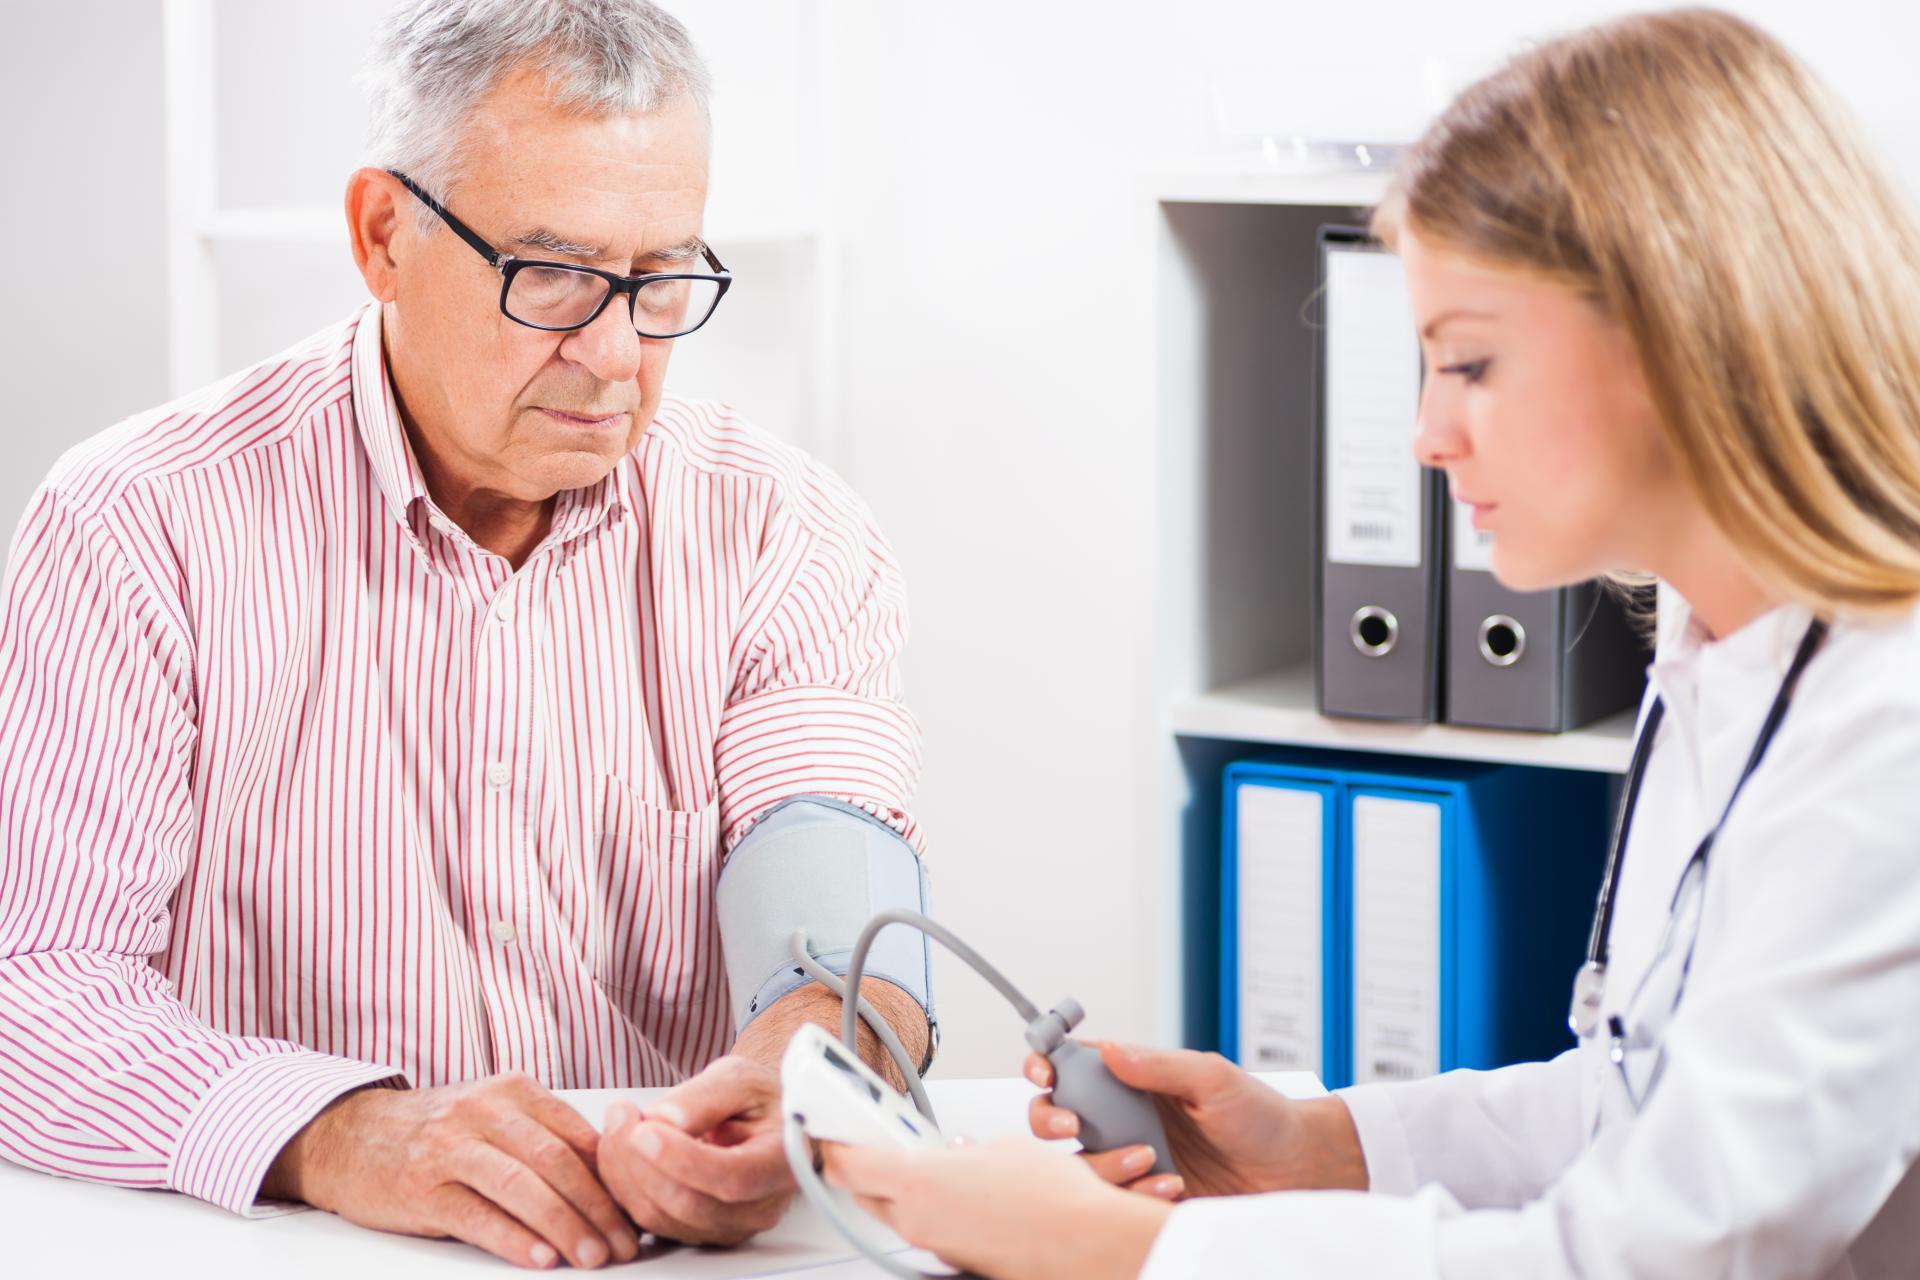 vrste dijagnoze hipertenzije rooibos hipertenzija